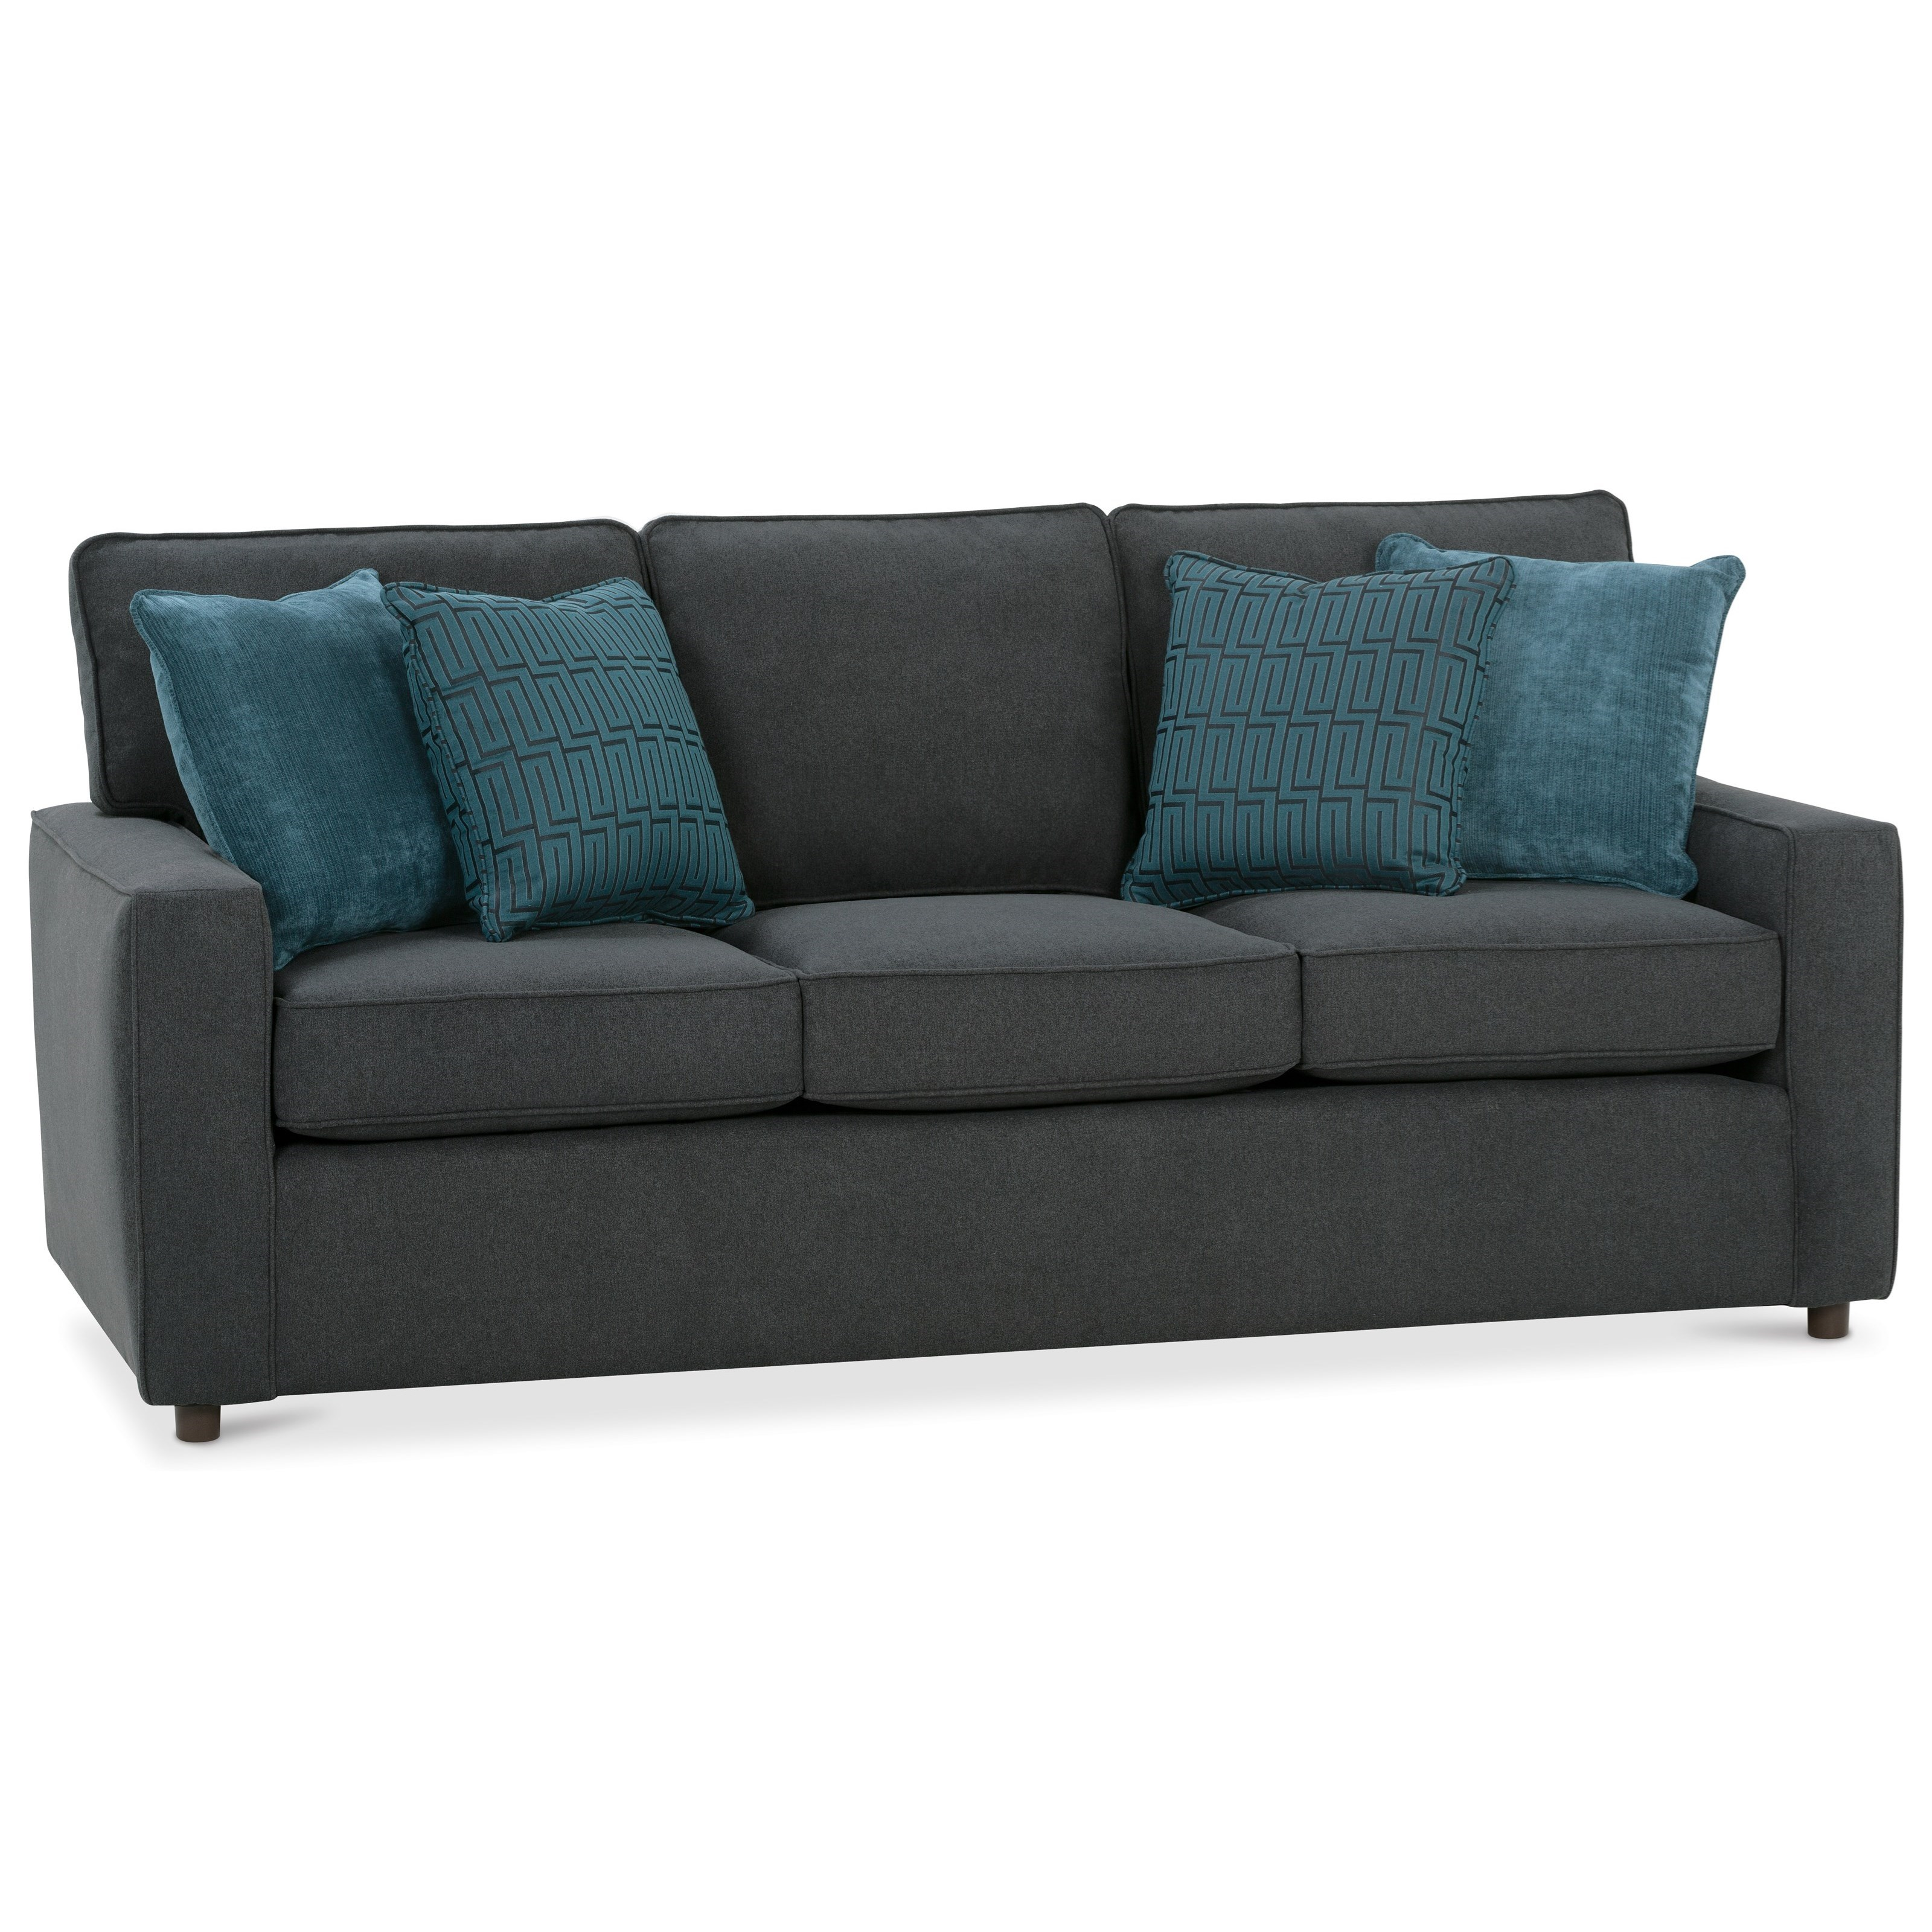 Monaco Mini Sofa by Rowe at Bullard Furniture